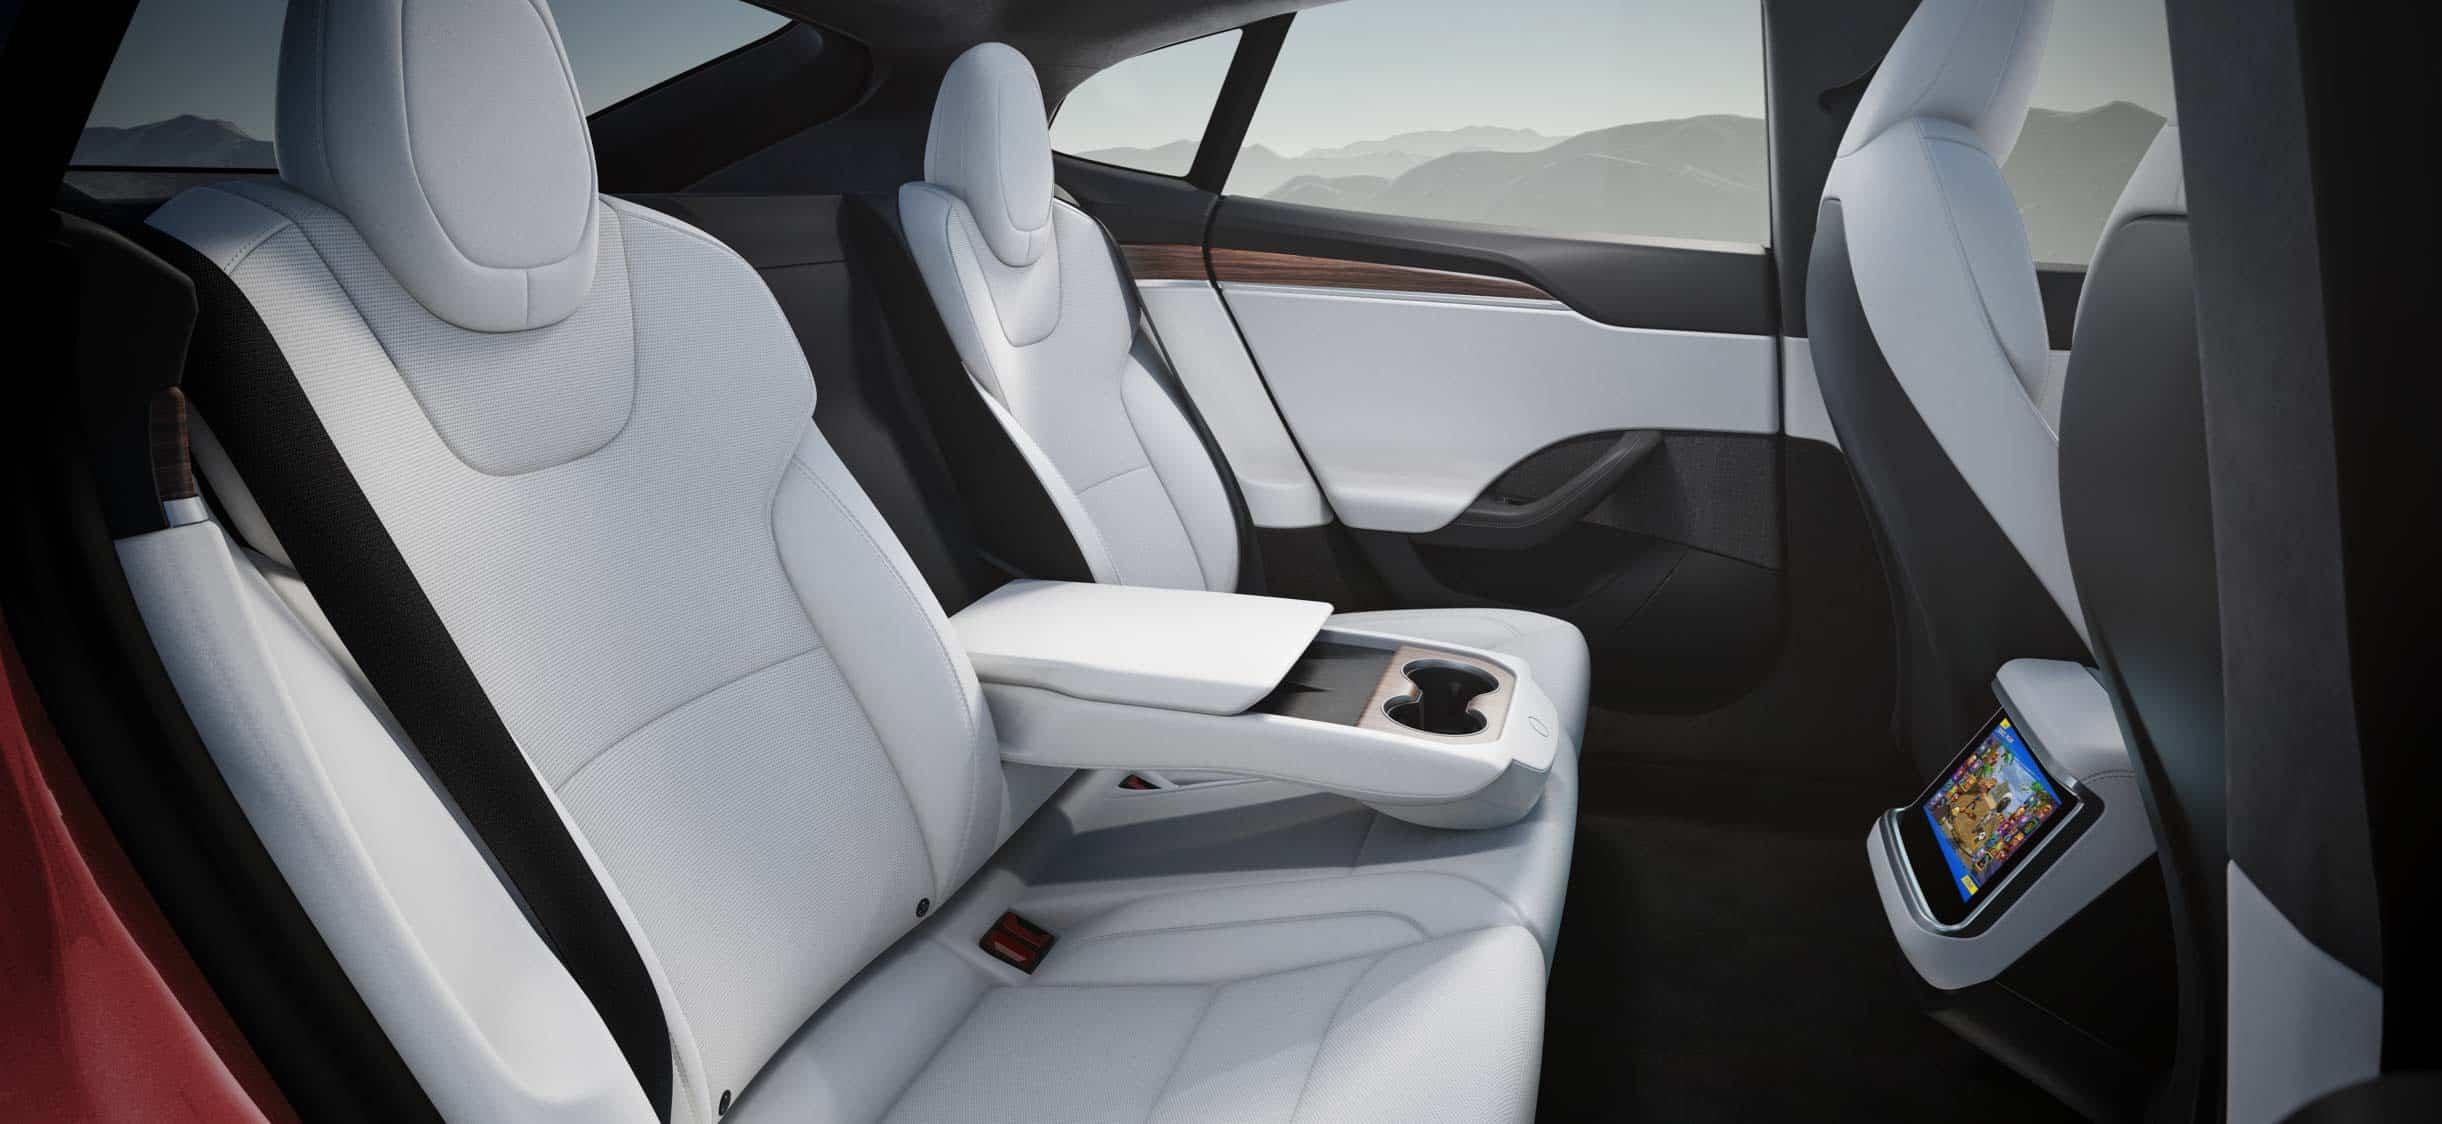 Салон Tesla Model S Plaid